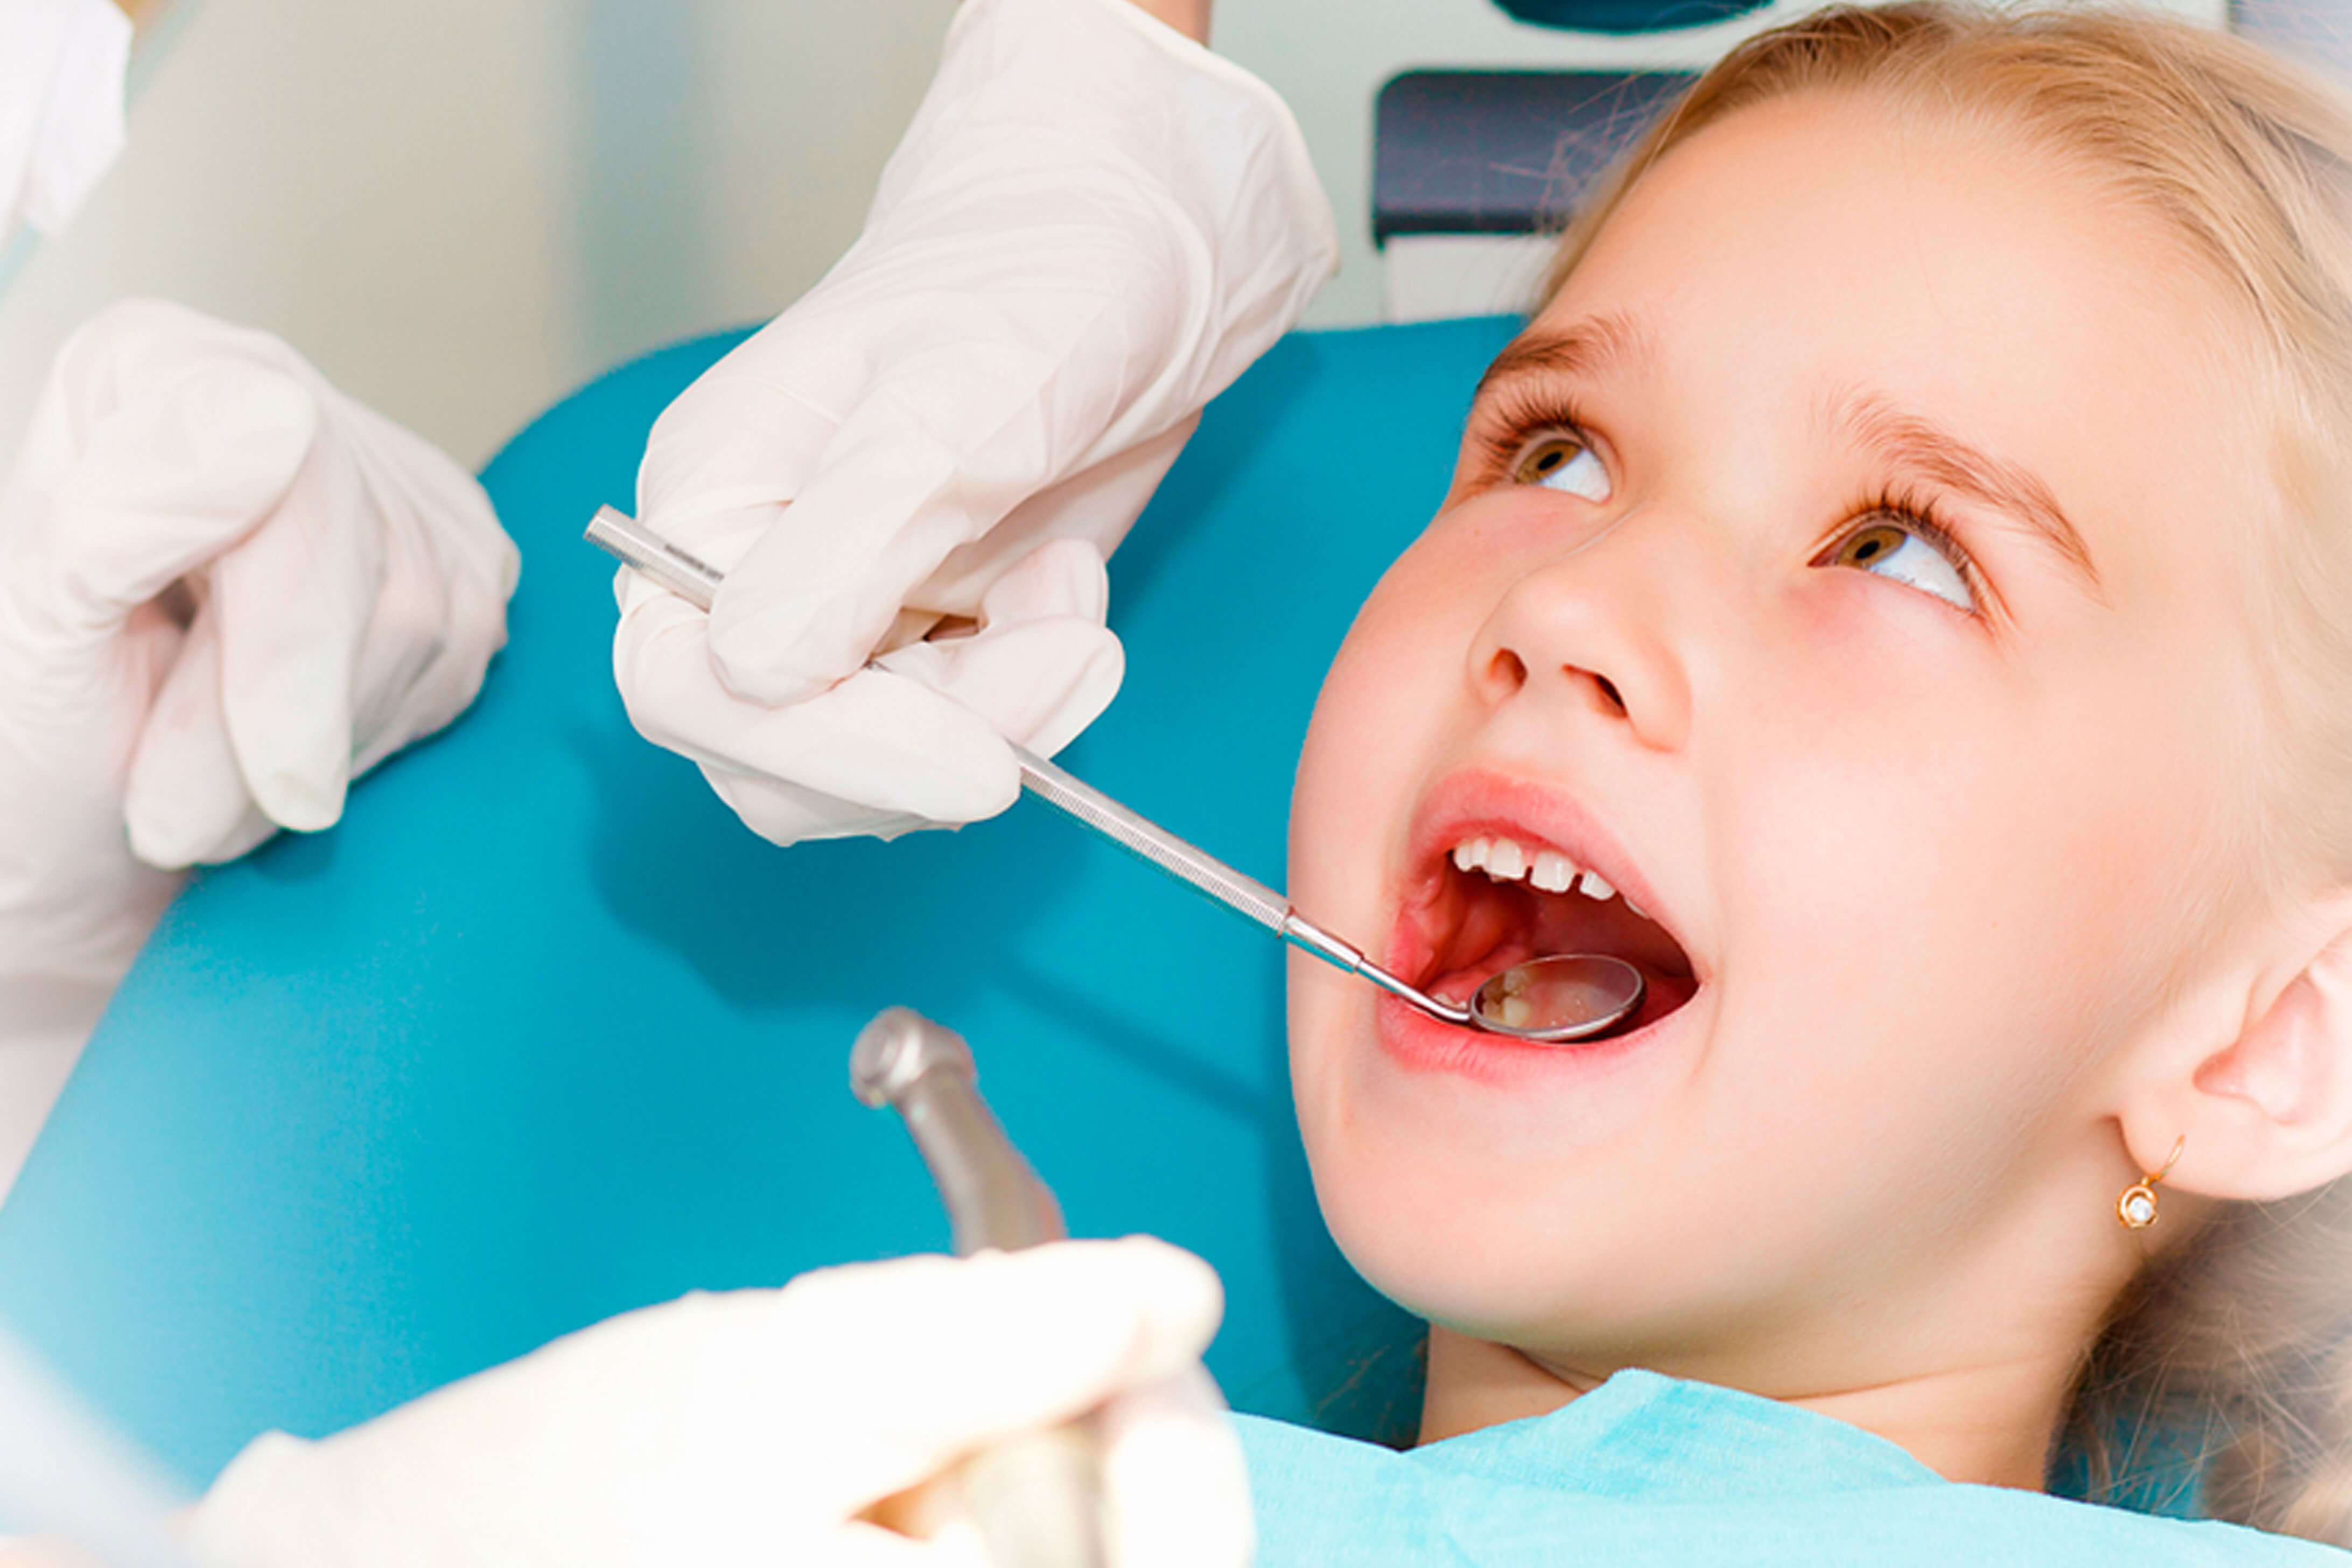 Dečiji razmak između zuba